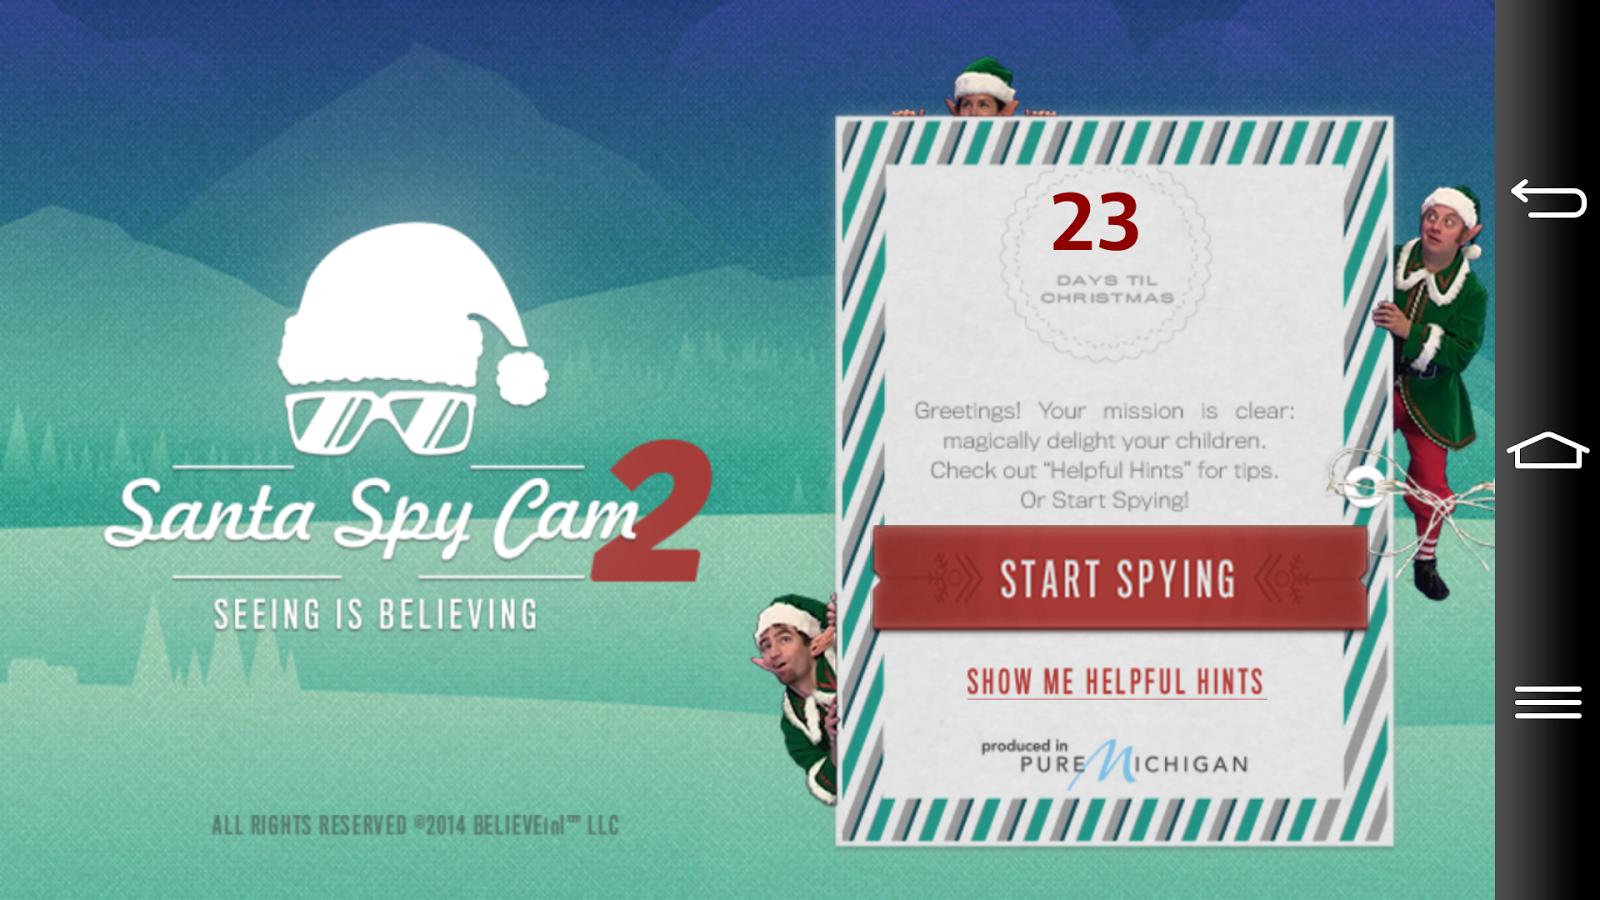 santa spy cam app android